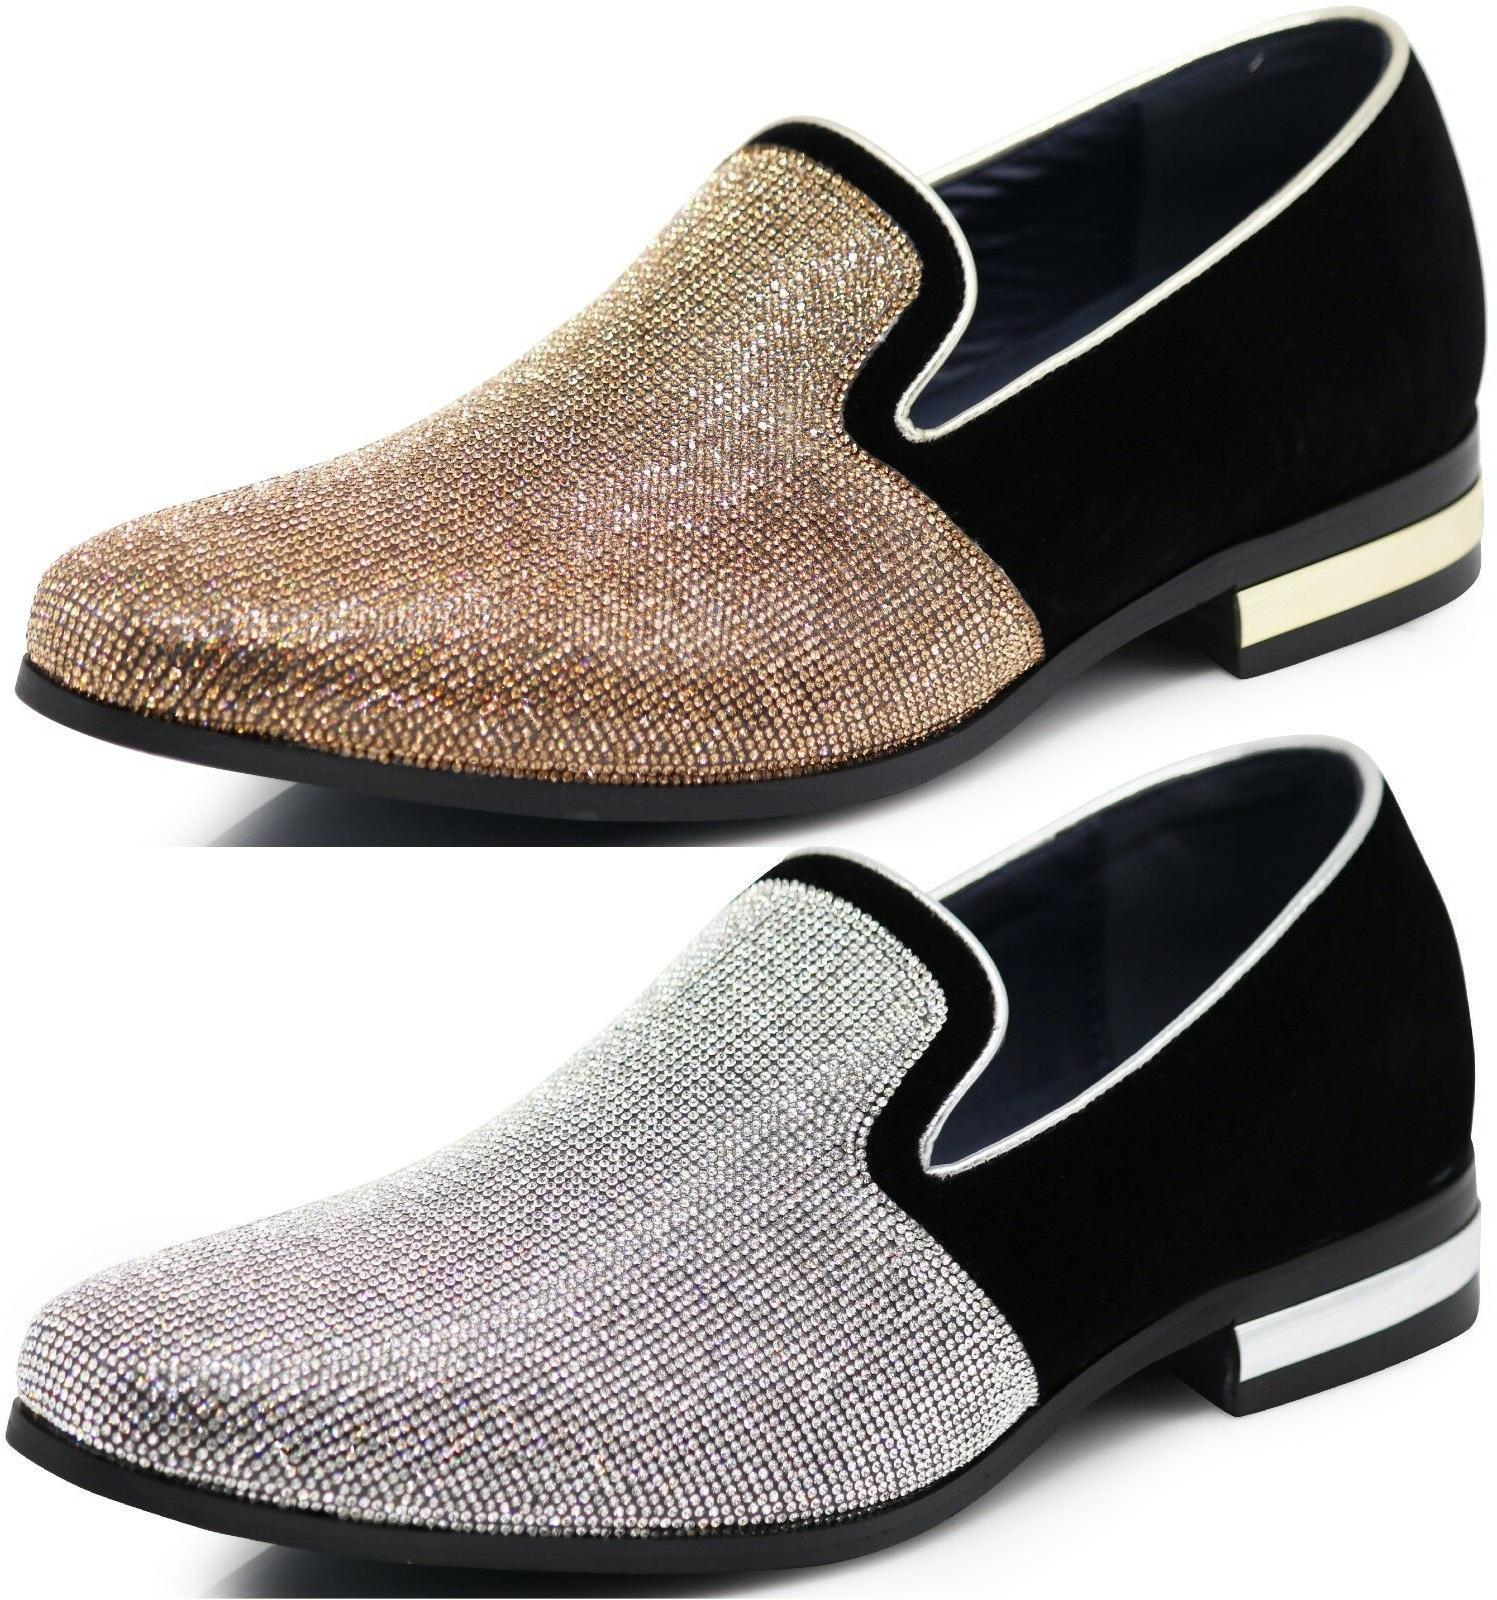 new men dress shoes rhinestone diamond loafers